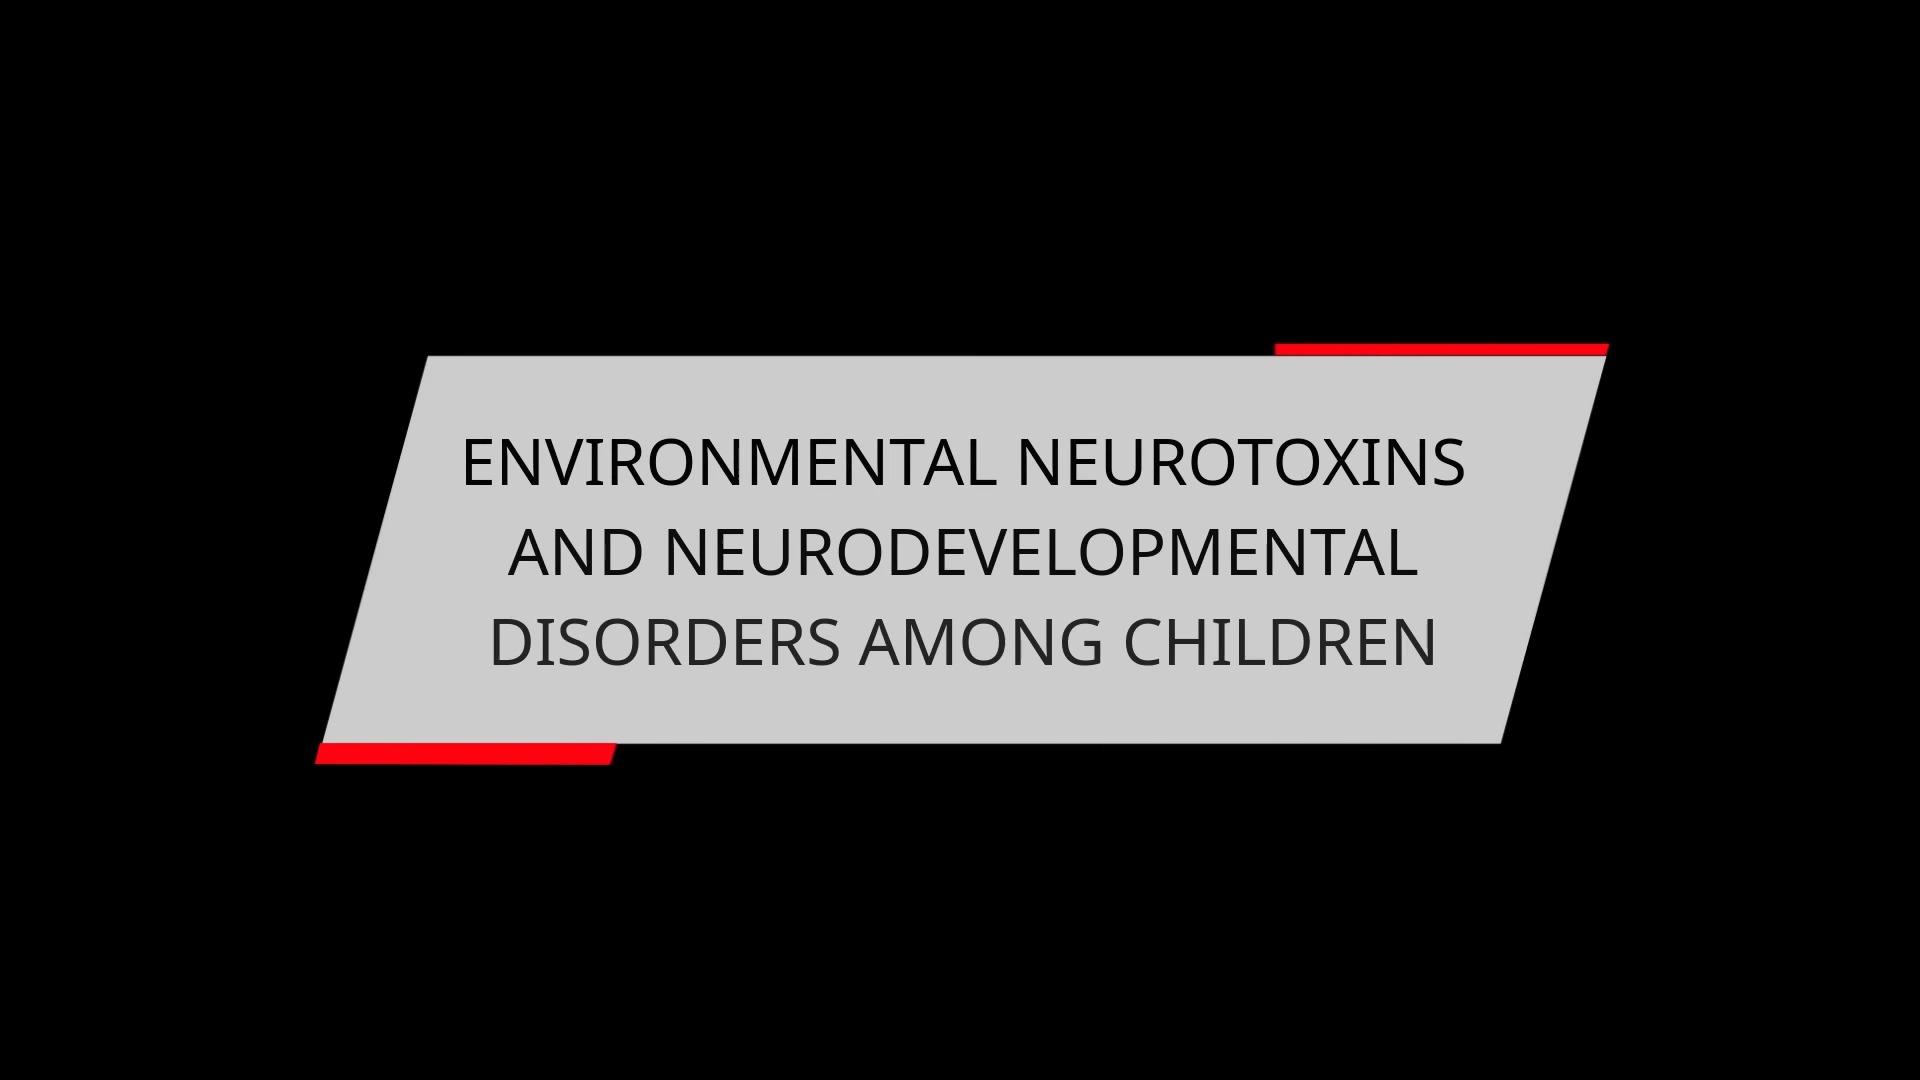 ENVIRONMENTAL NEUROTOXINS AND NEURODEVELOPMENTAL DISORDERS AMONG CHILDREN